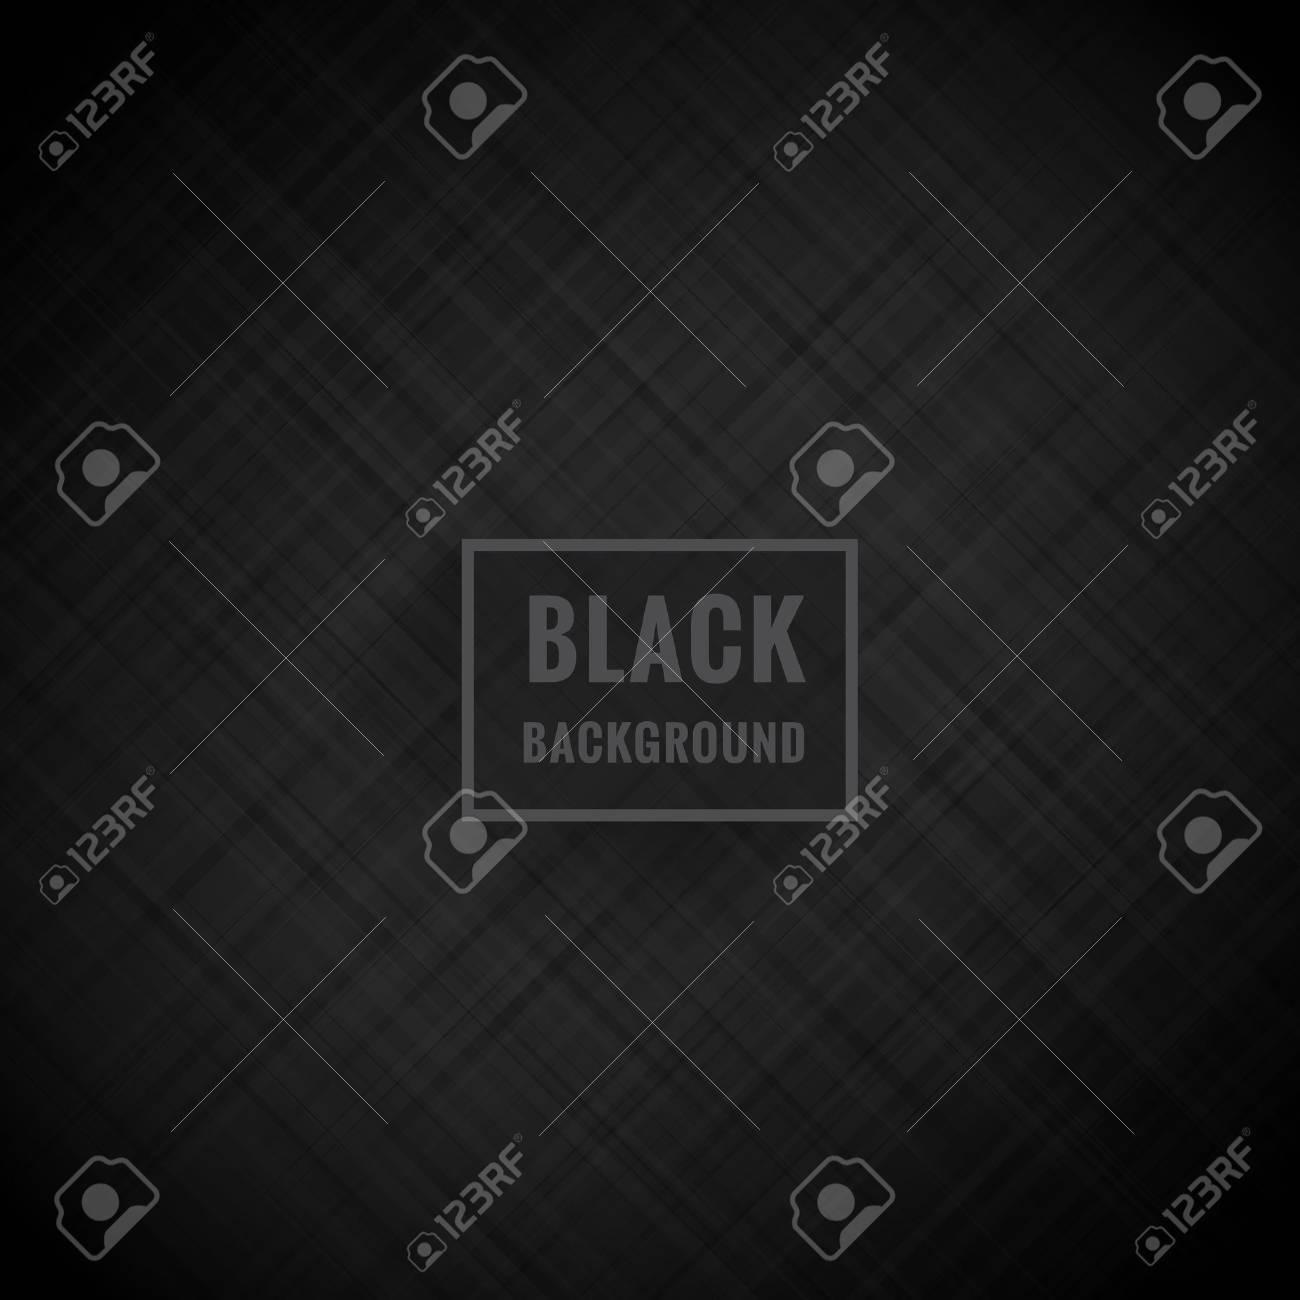 black texture background - 57685825